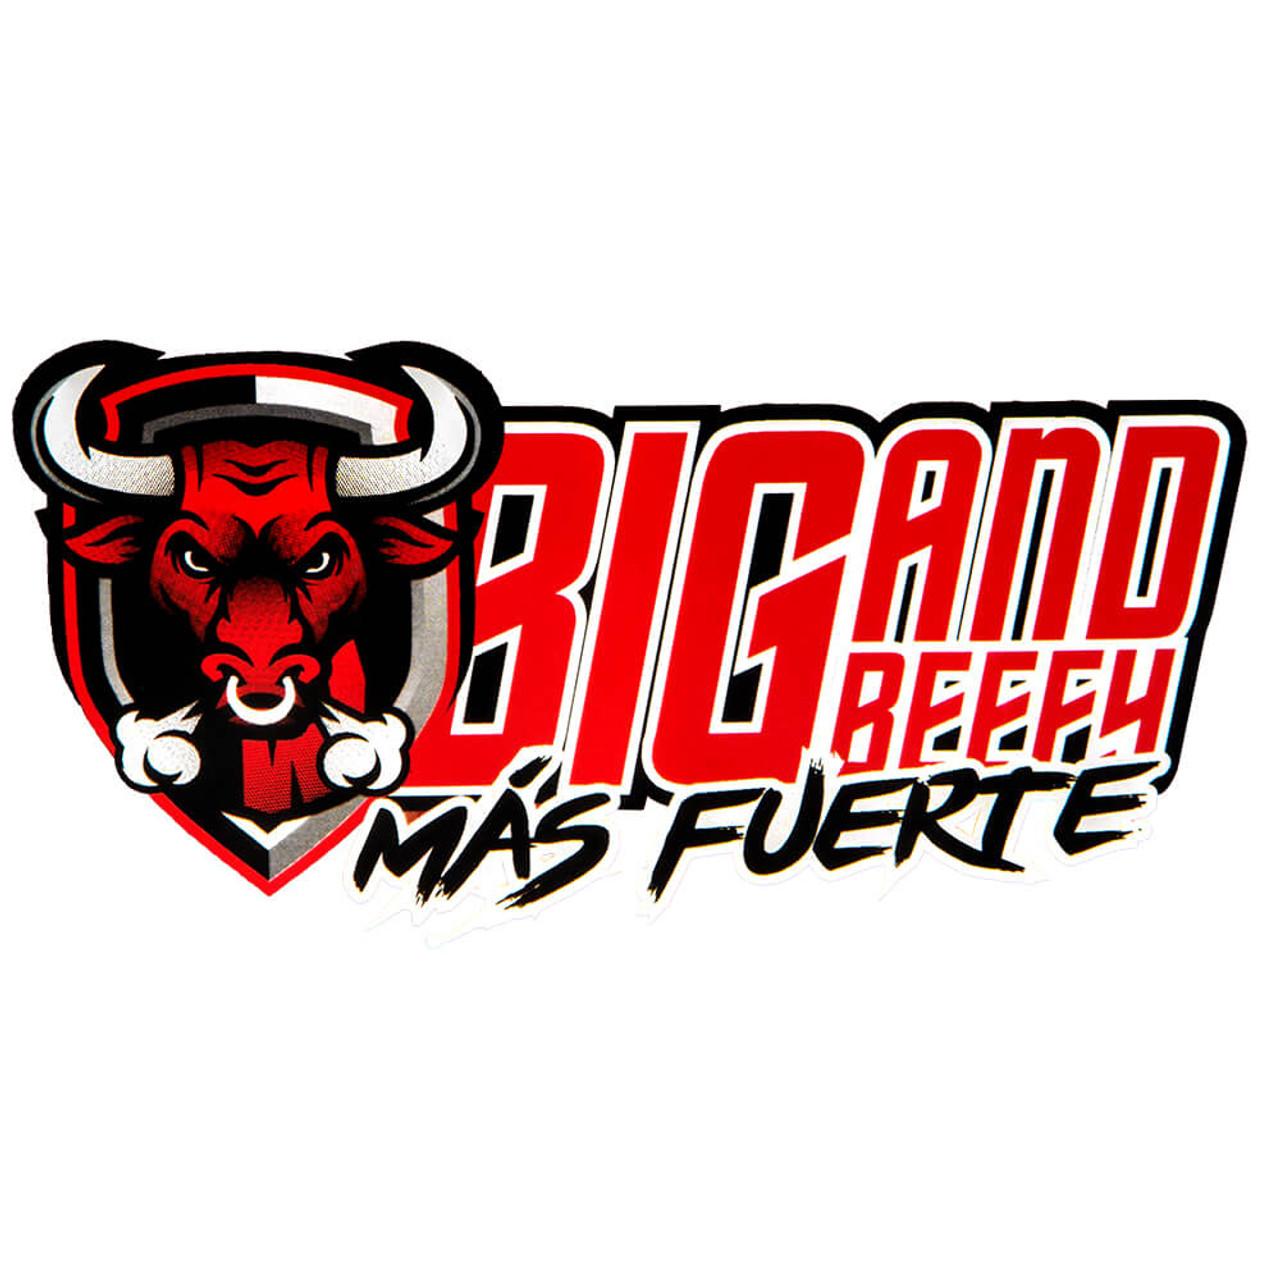 Big and Beefy Mas Fuerte No. 570 Cigars - 5 x 70 (Bundle of 10)